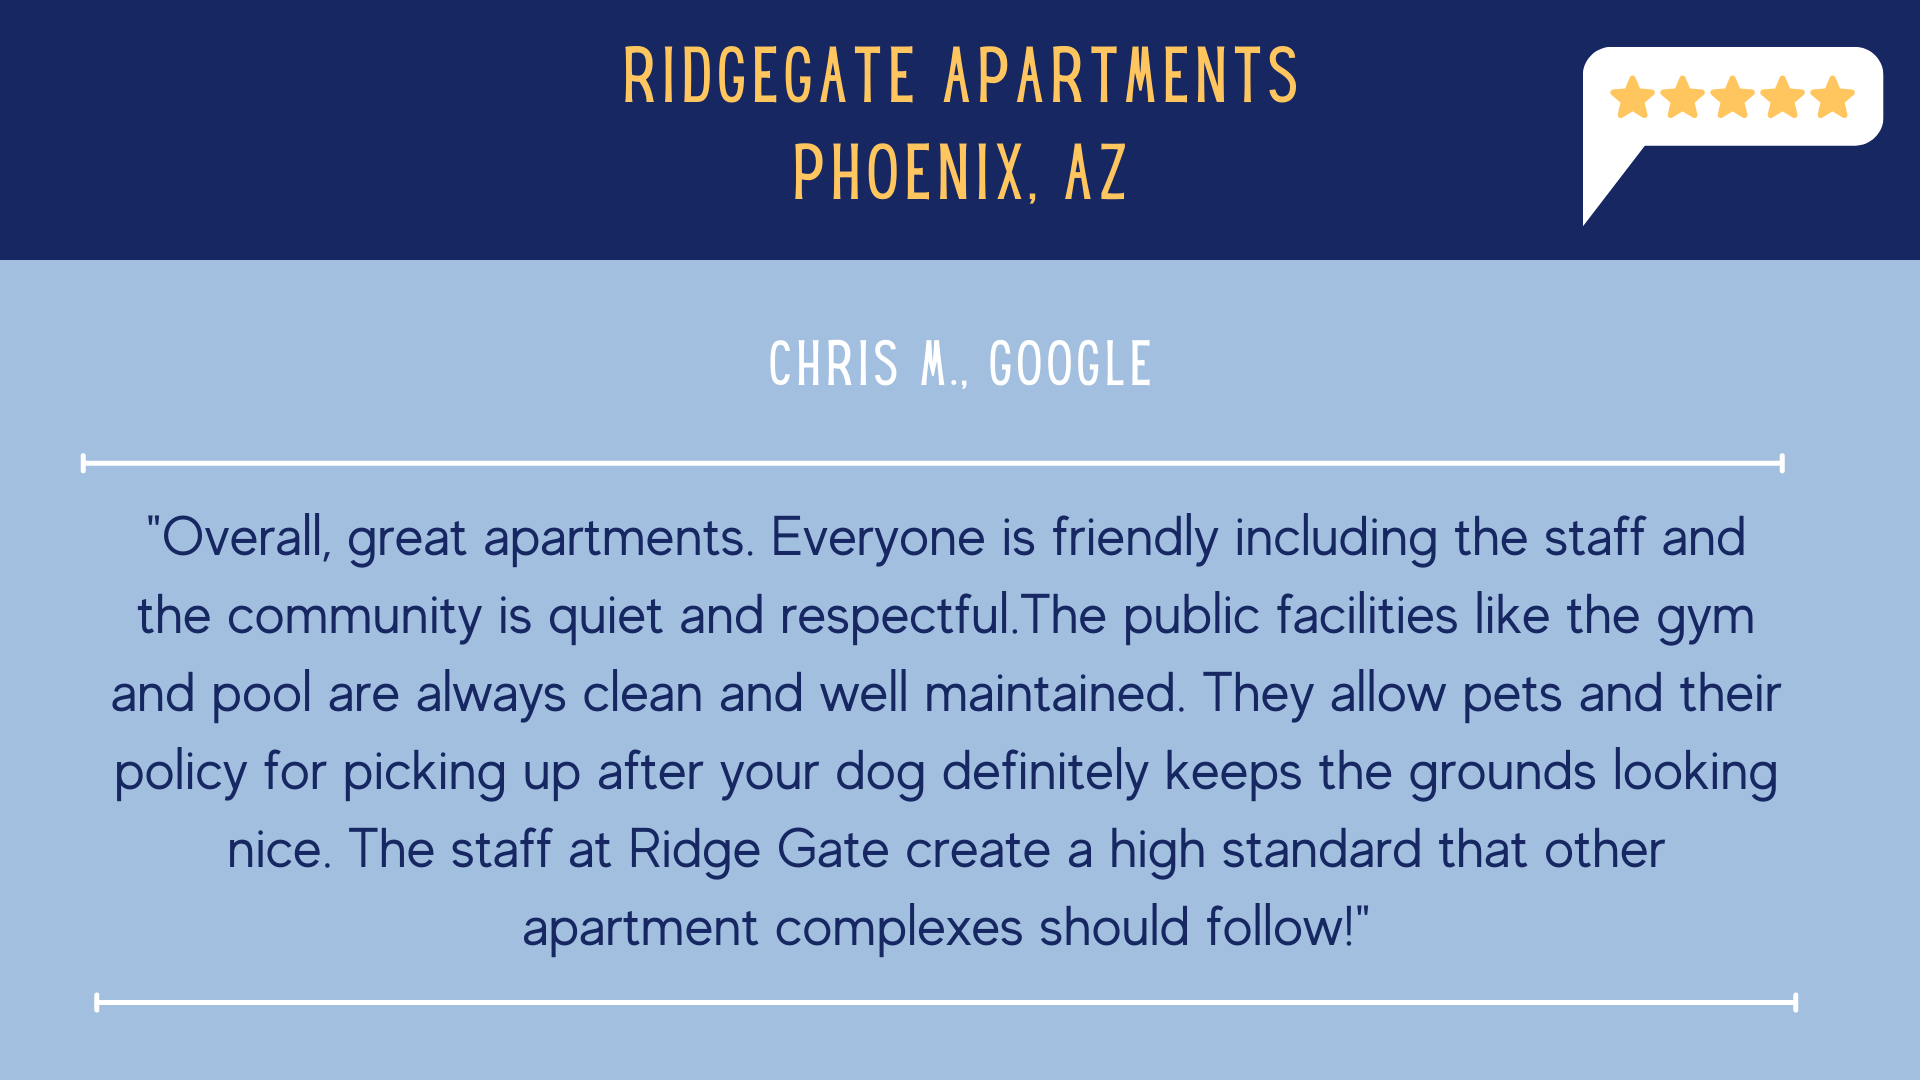 RidgeGate Apartments 5 Star Review